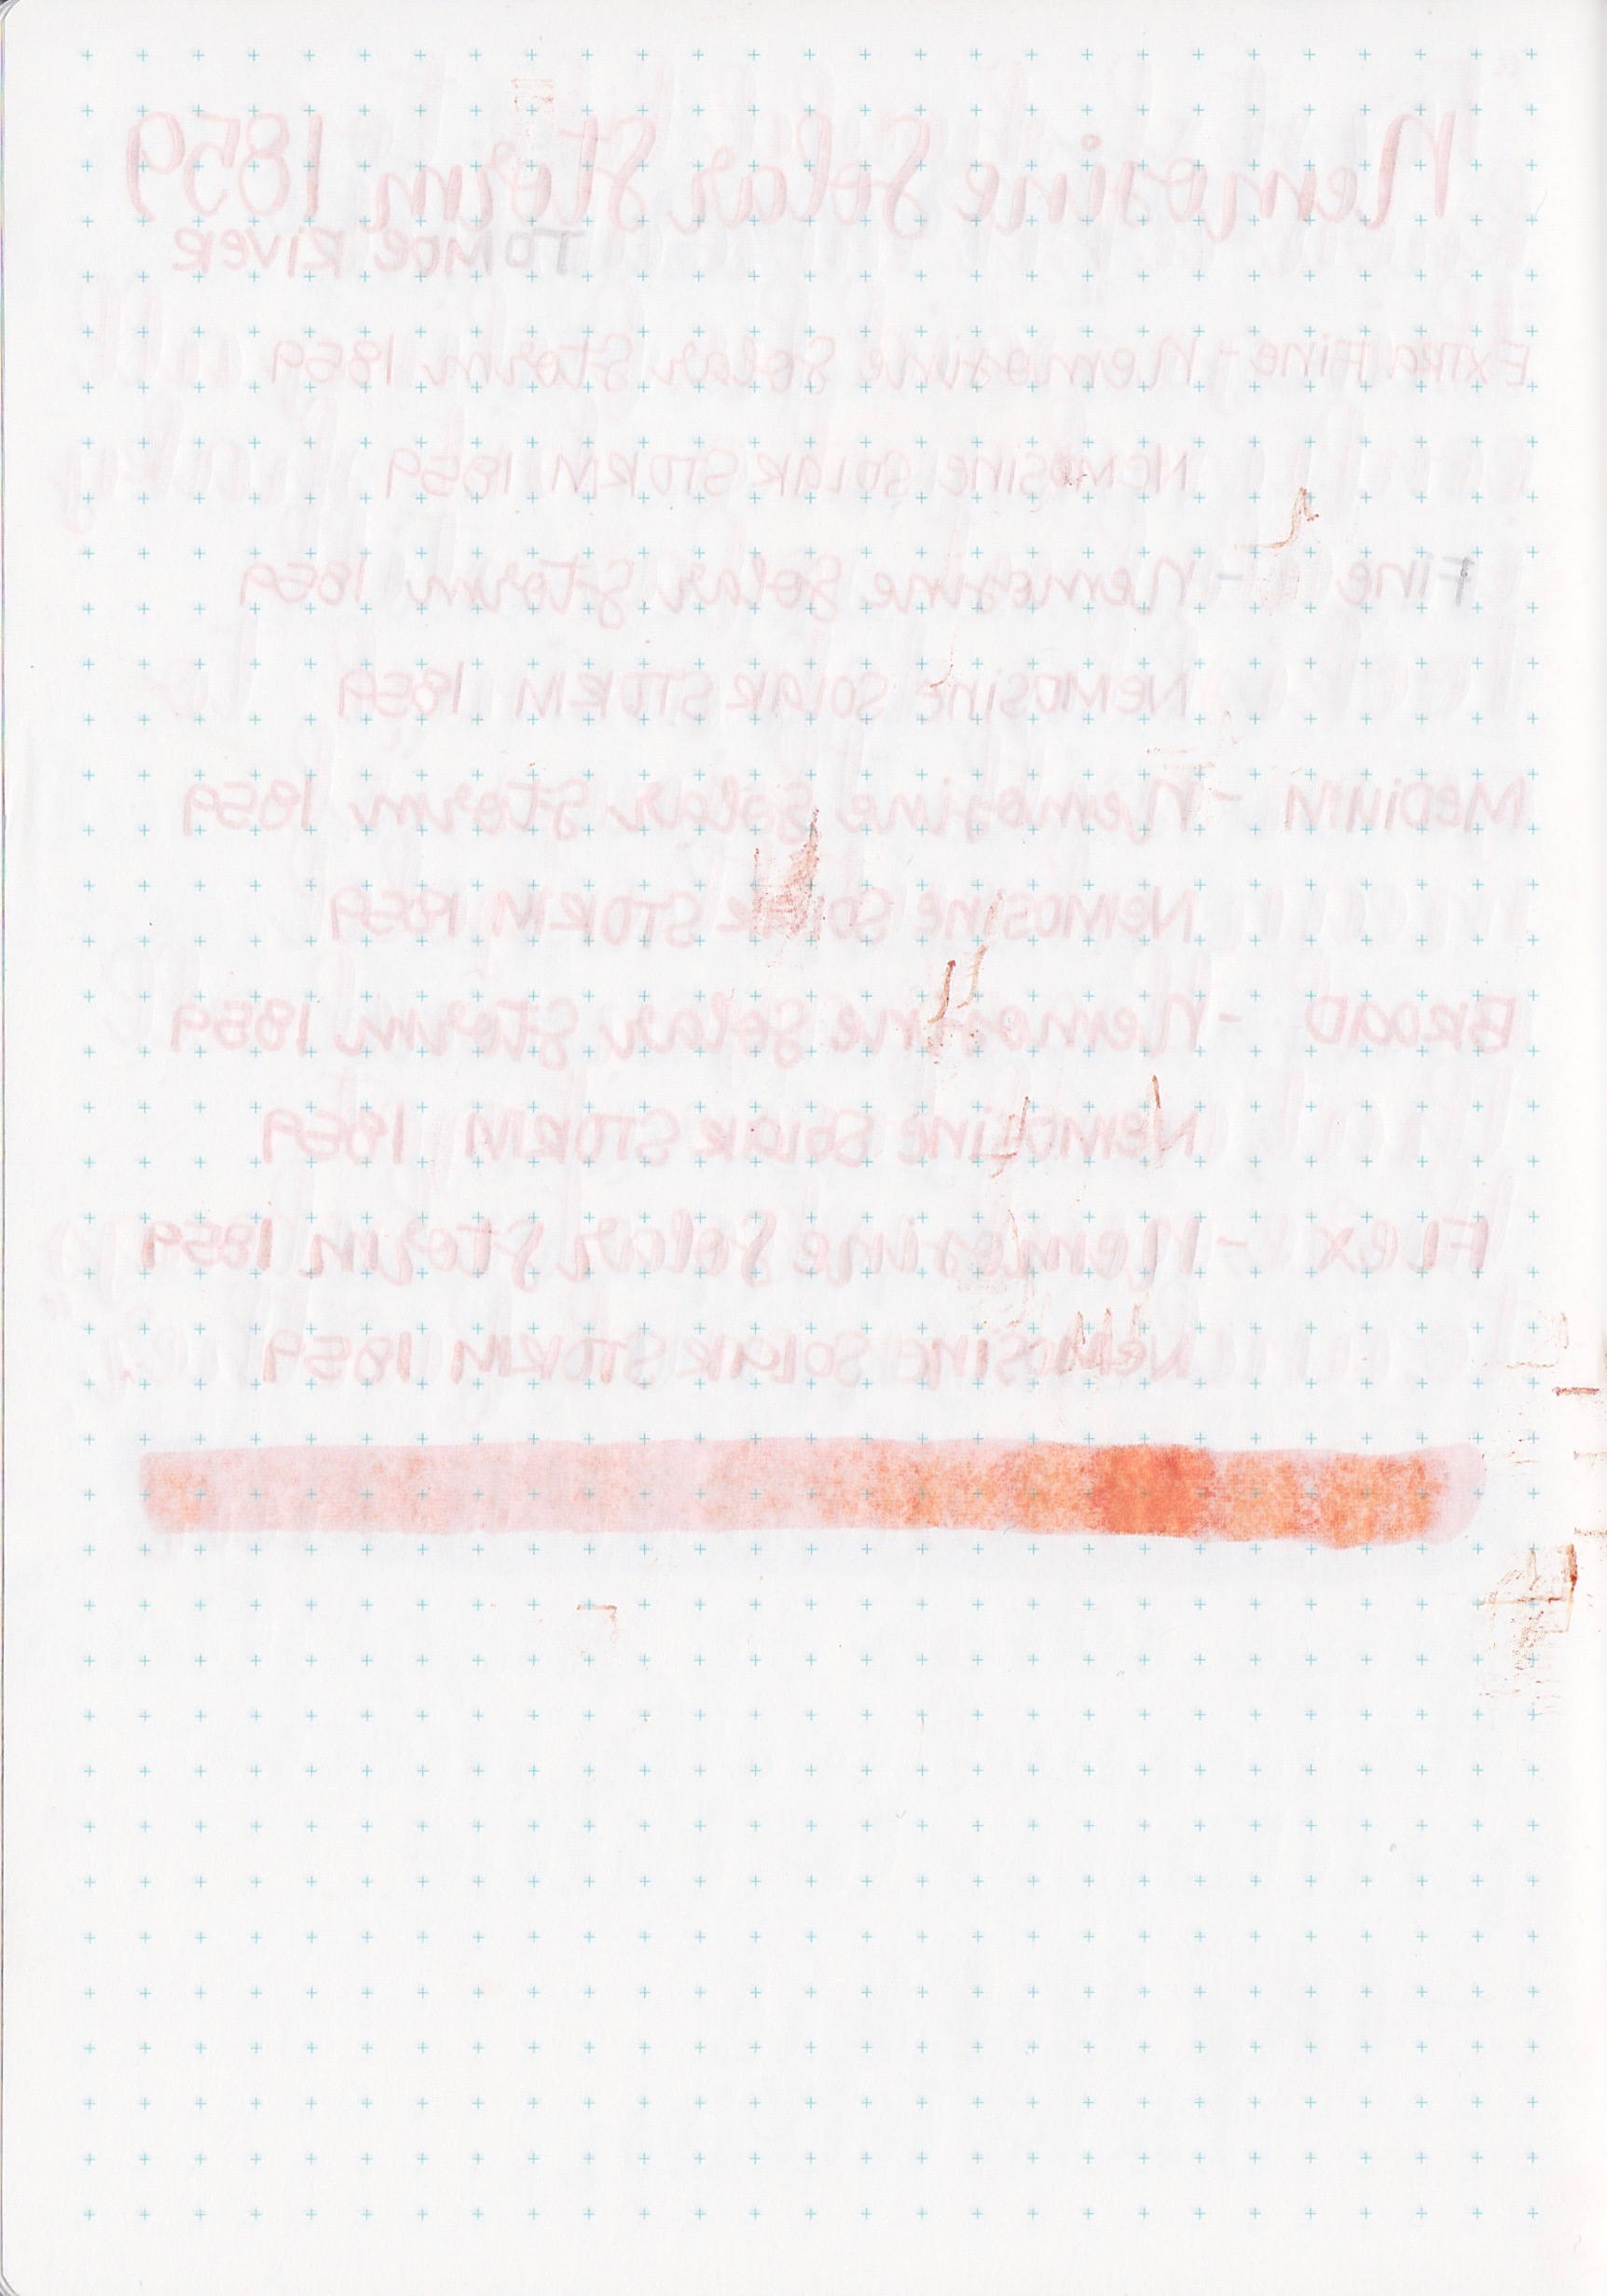 NSolarStorm1859 - 7.jpg